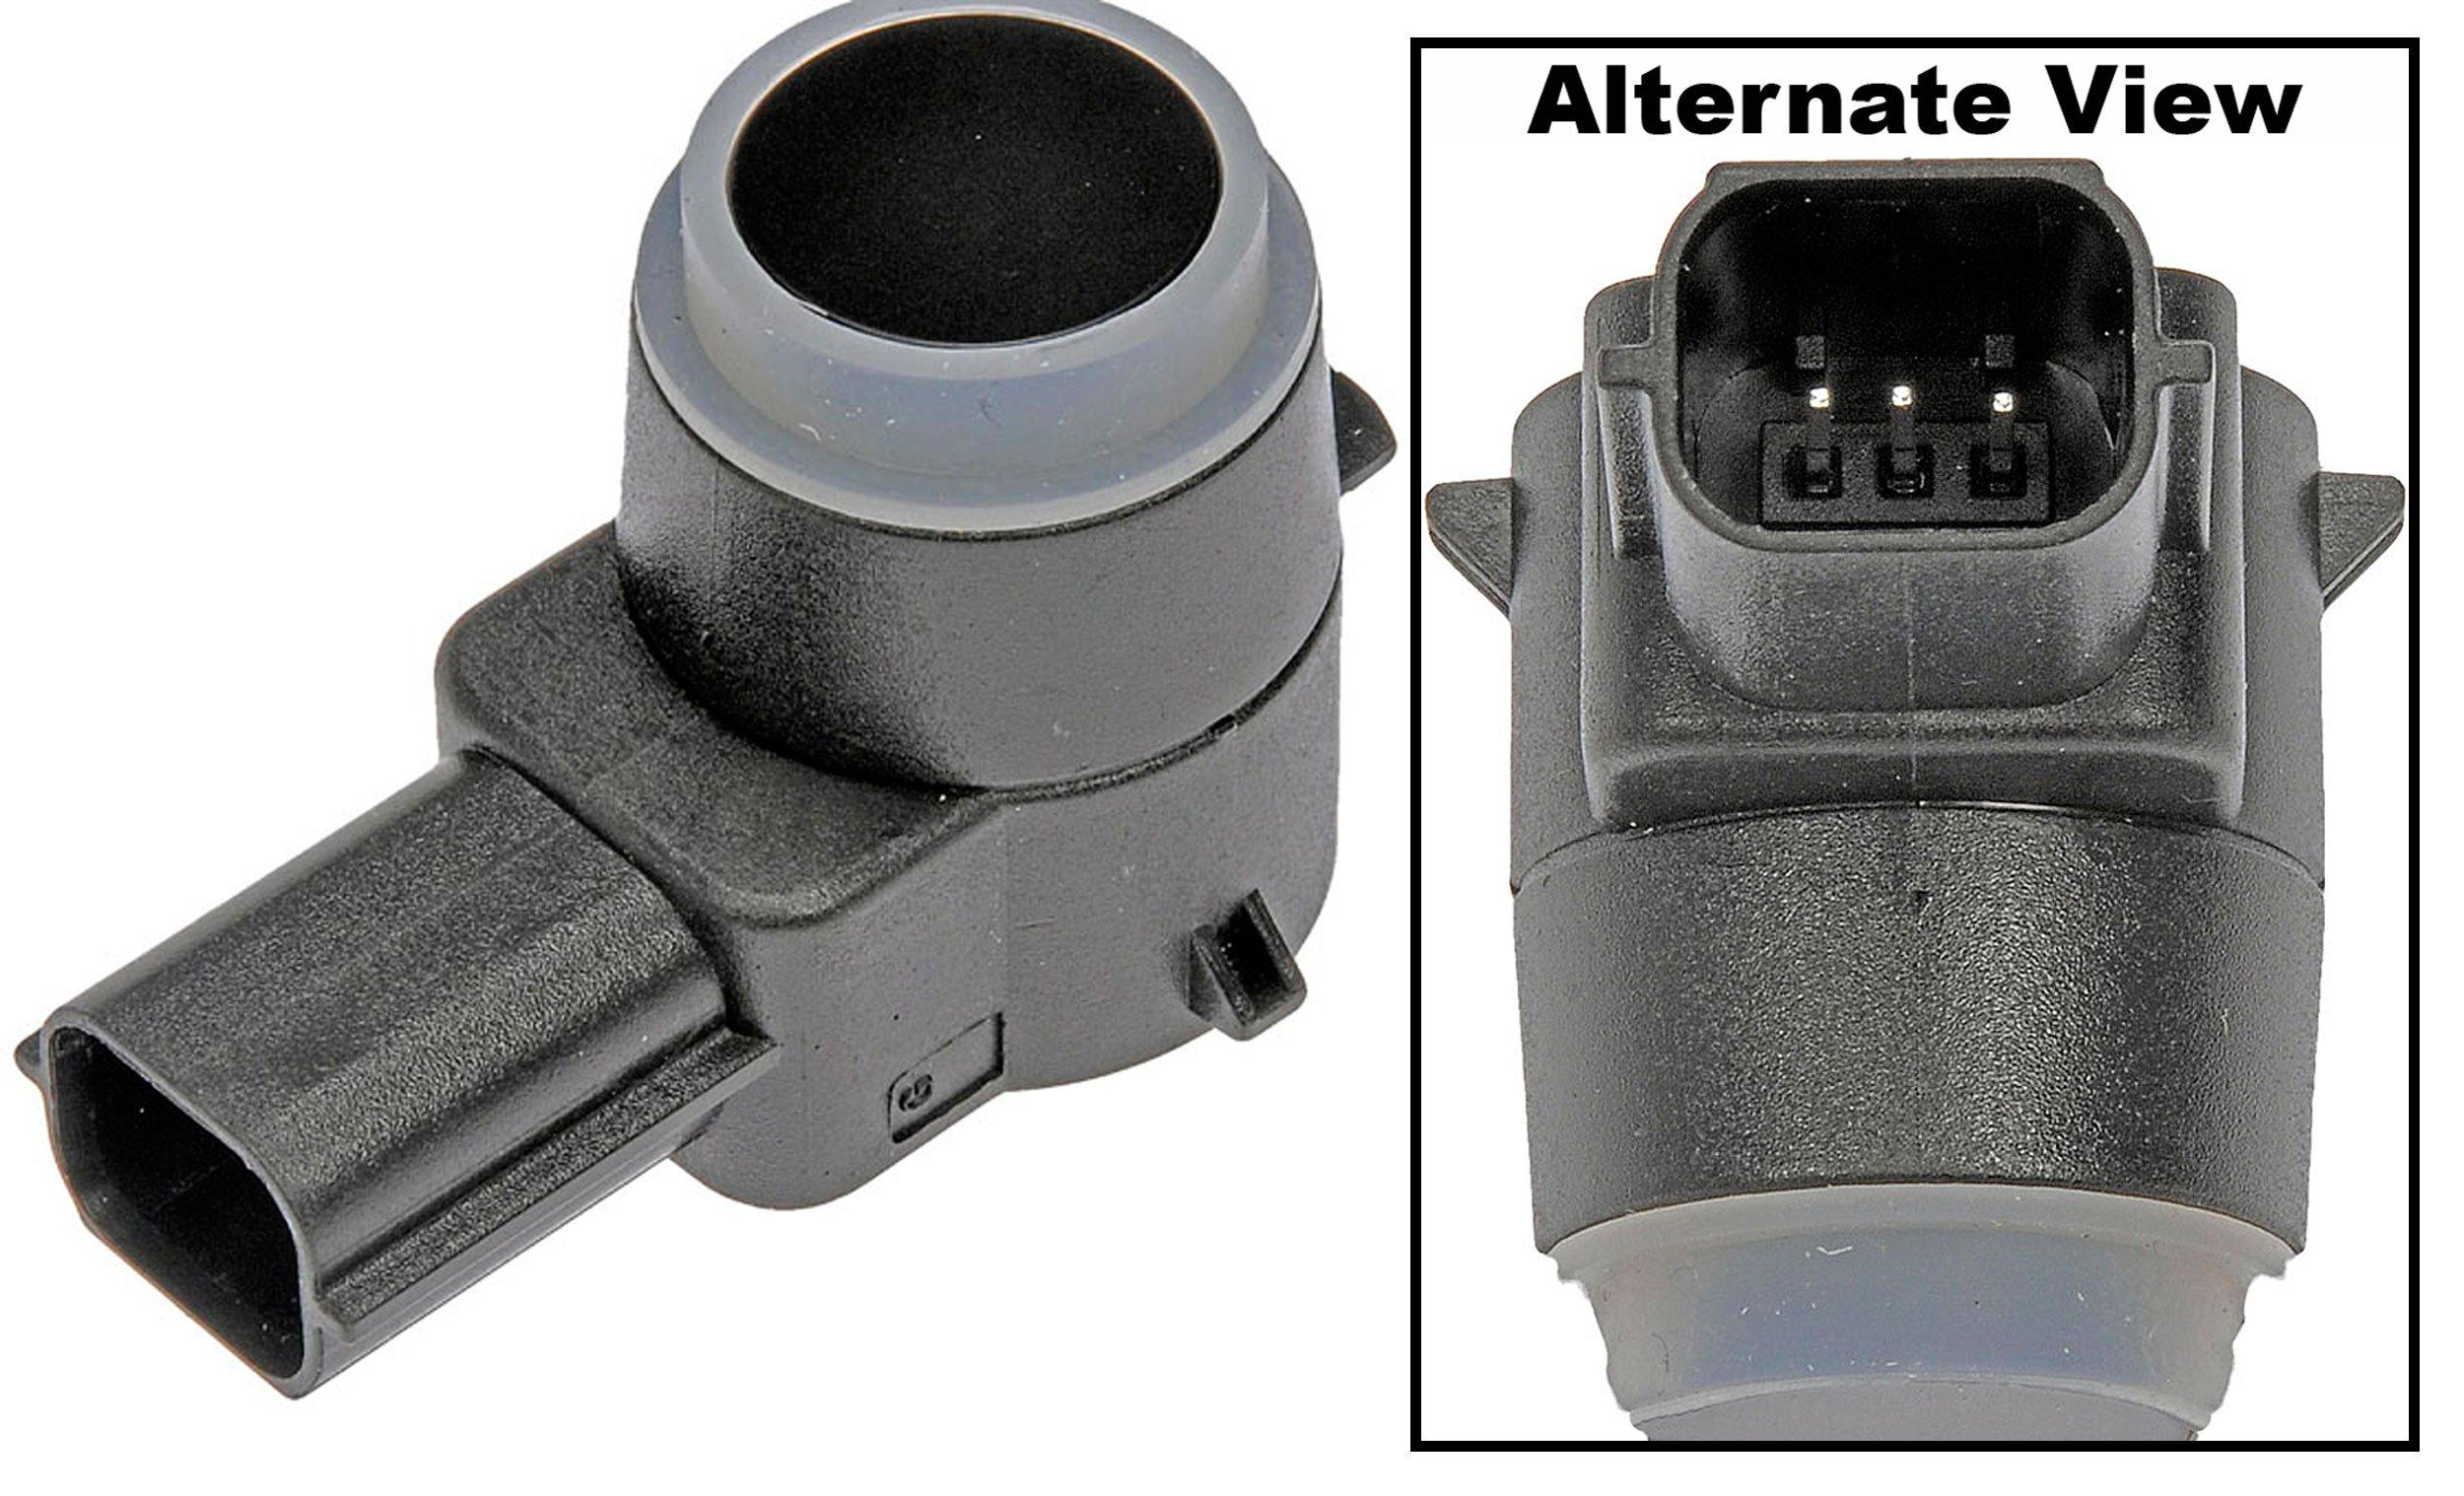 APDTY 795118 Backup PDC Park Reverse Parking Assist Sensor Fits Select 2009-2017 Dodge Chrysler Jeep (Replaces 1EW63TZZAA)